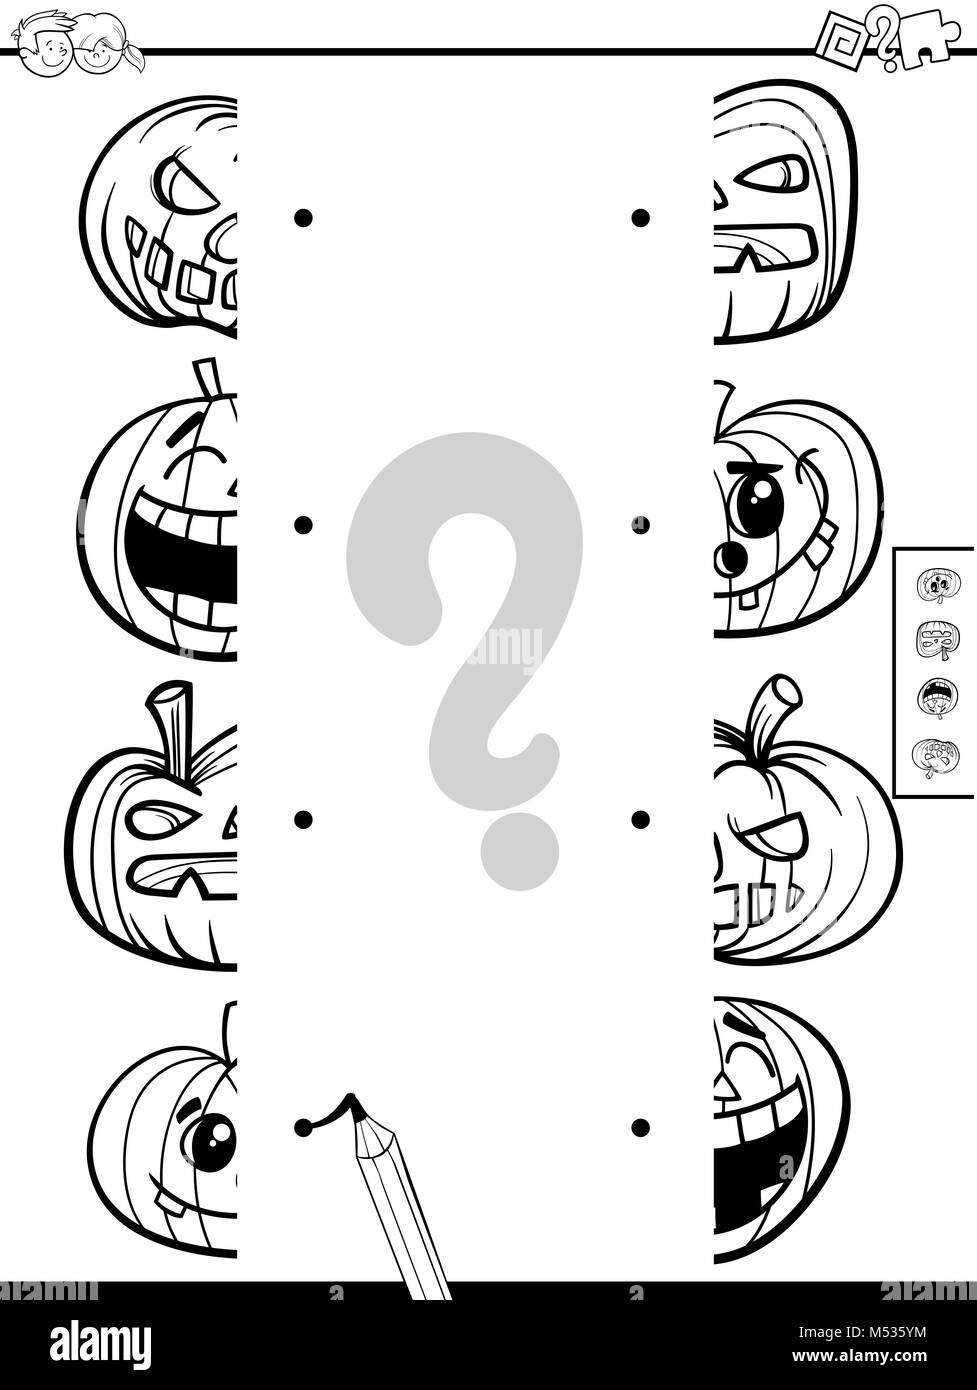 match halves of pumpkins coloring book - Stock Image